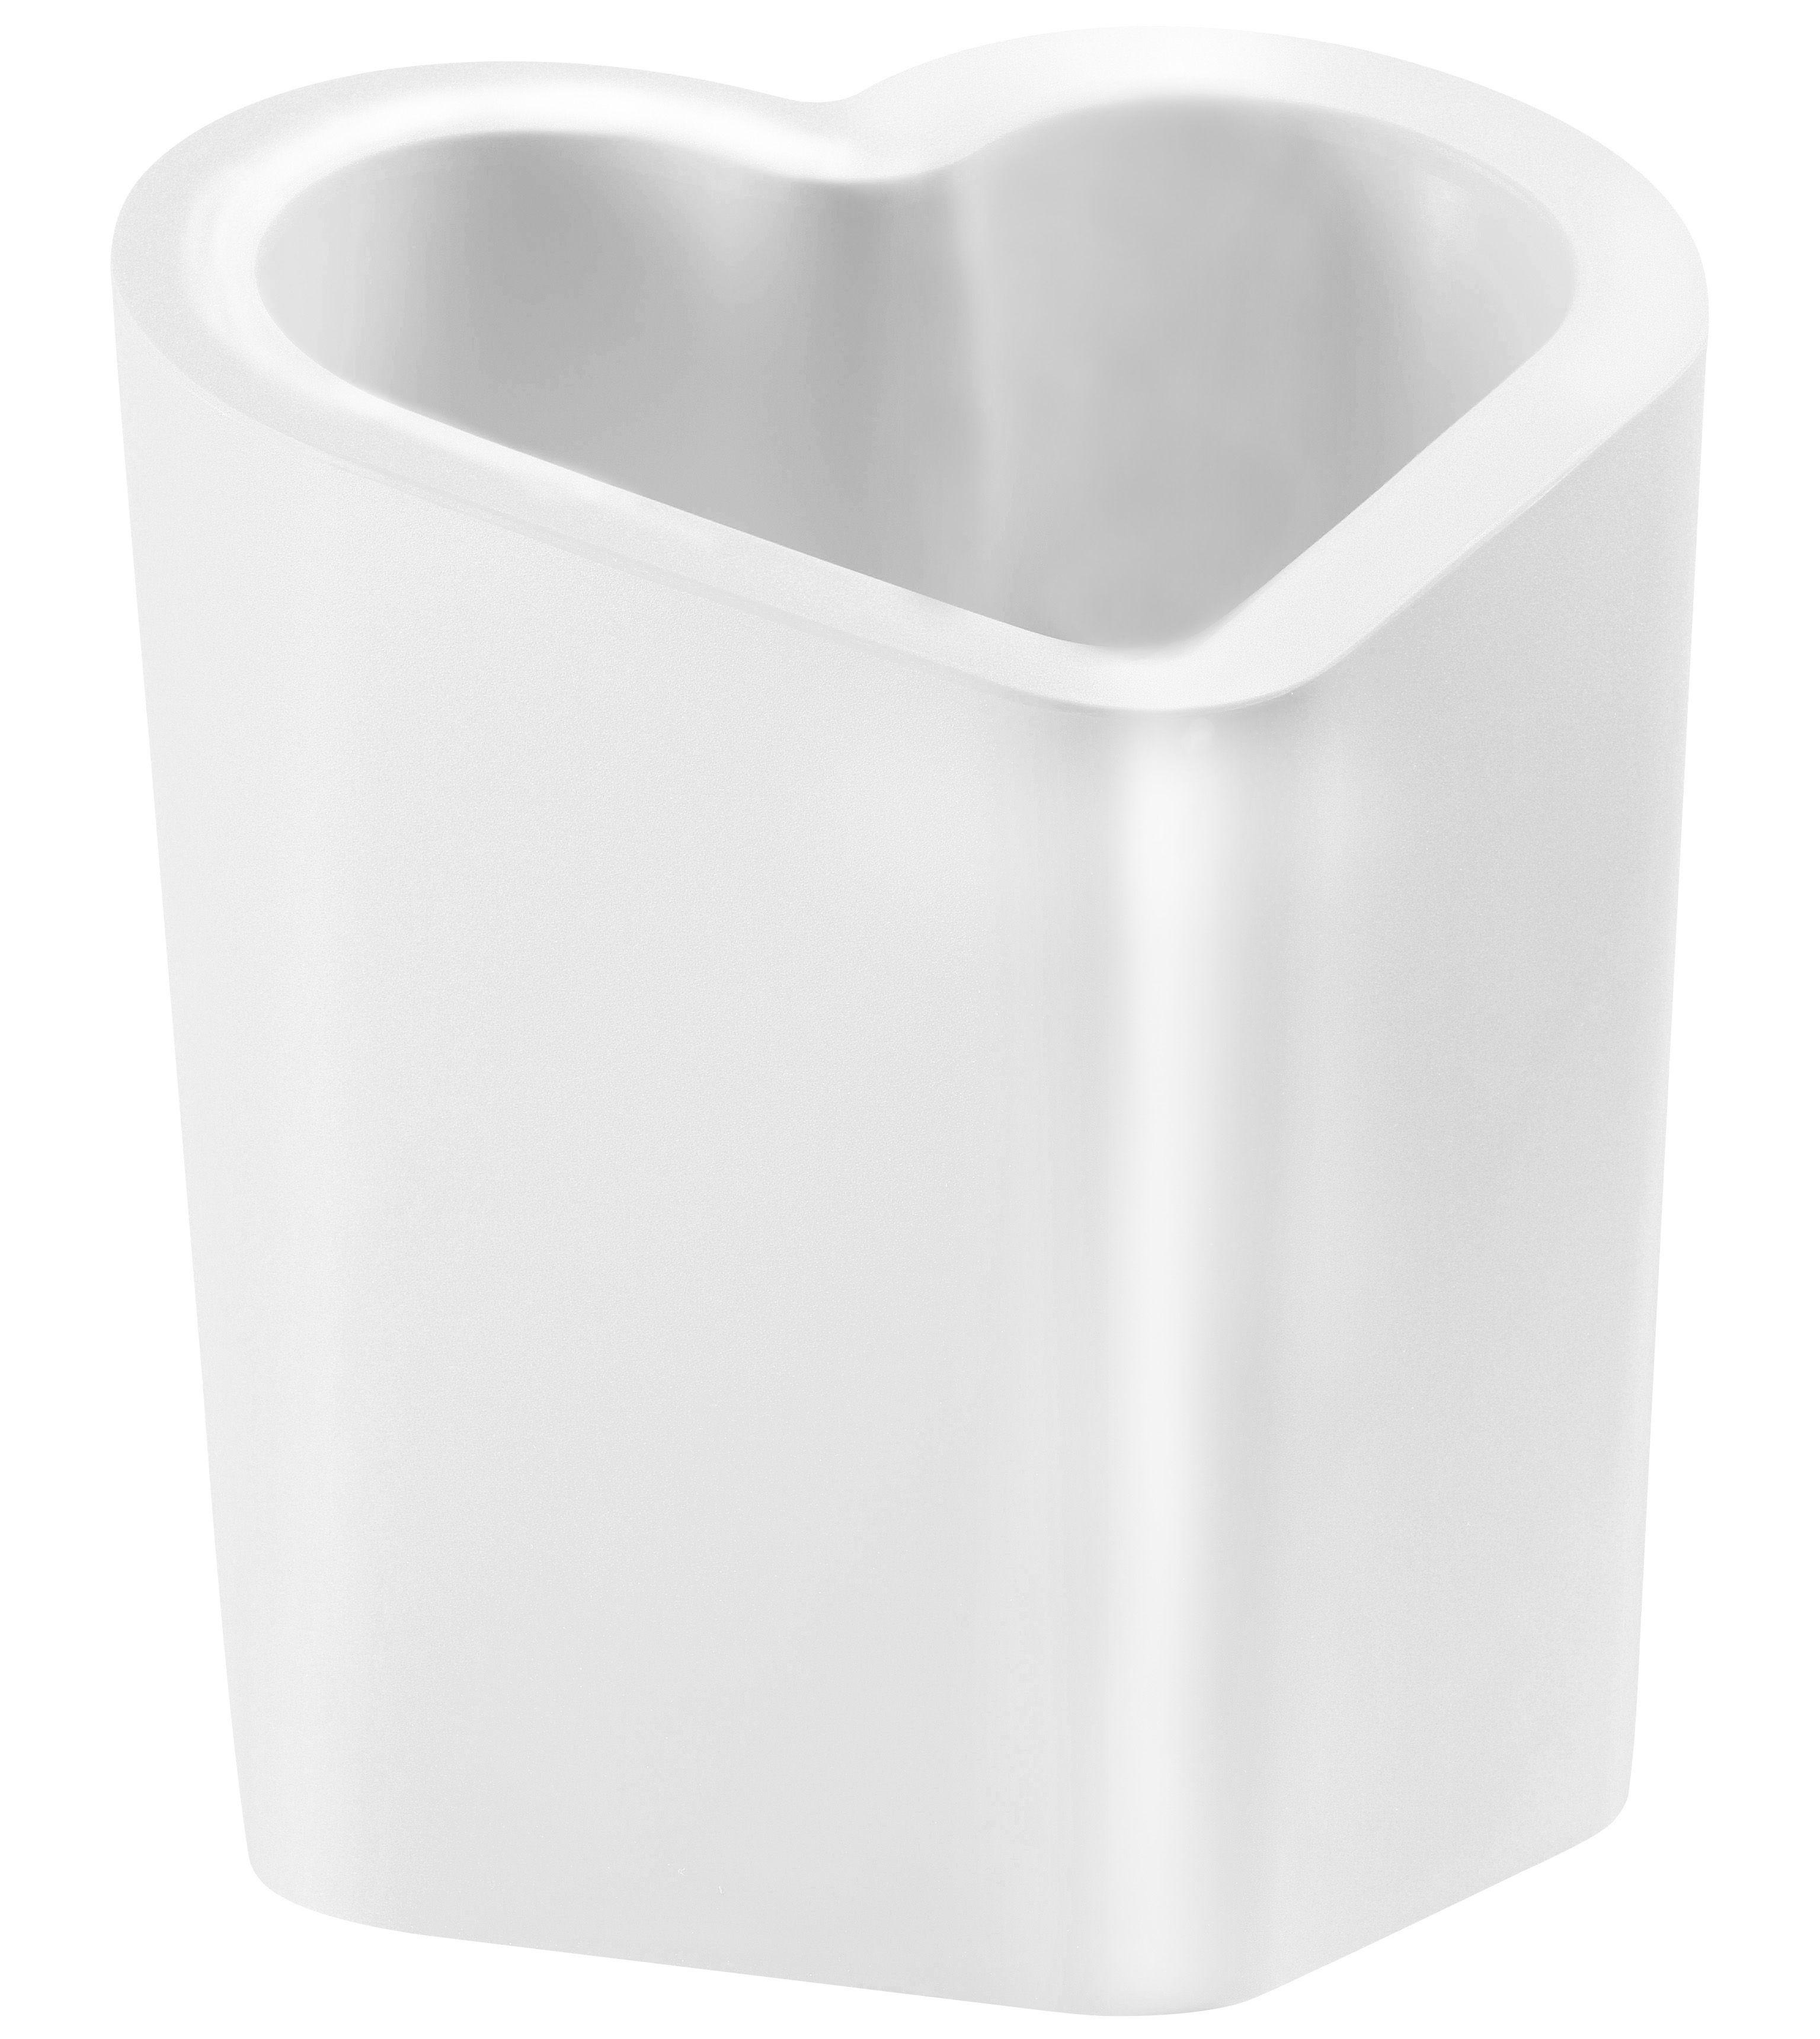 Outdoor - Töpfe und Pflanzen - Mon Amour Blumentopf lackiert - Slide - Weiß lackiert - polyéthène recyclable